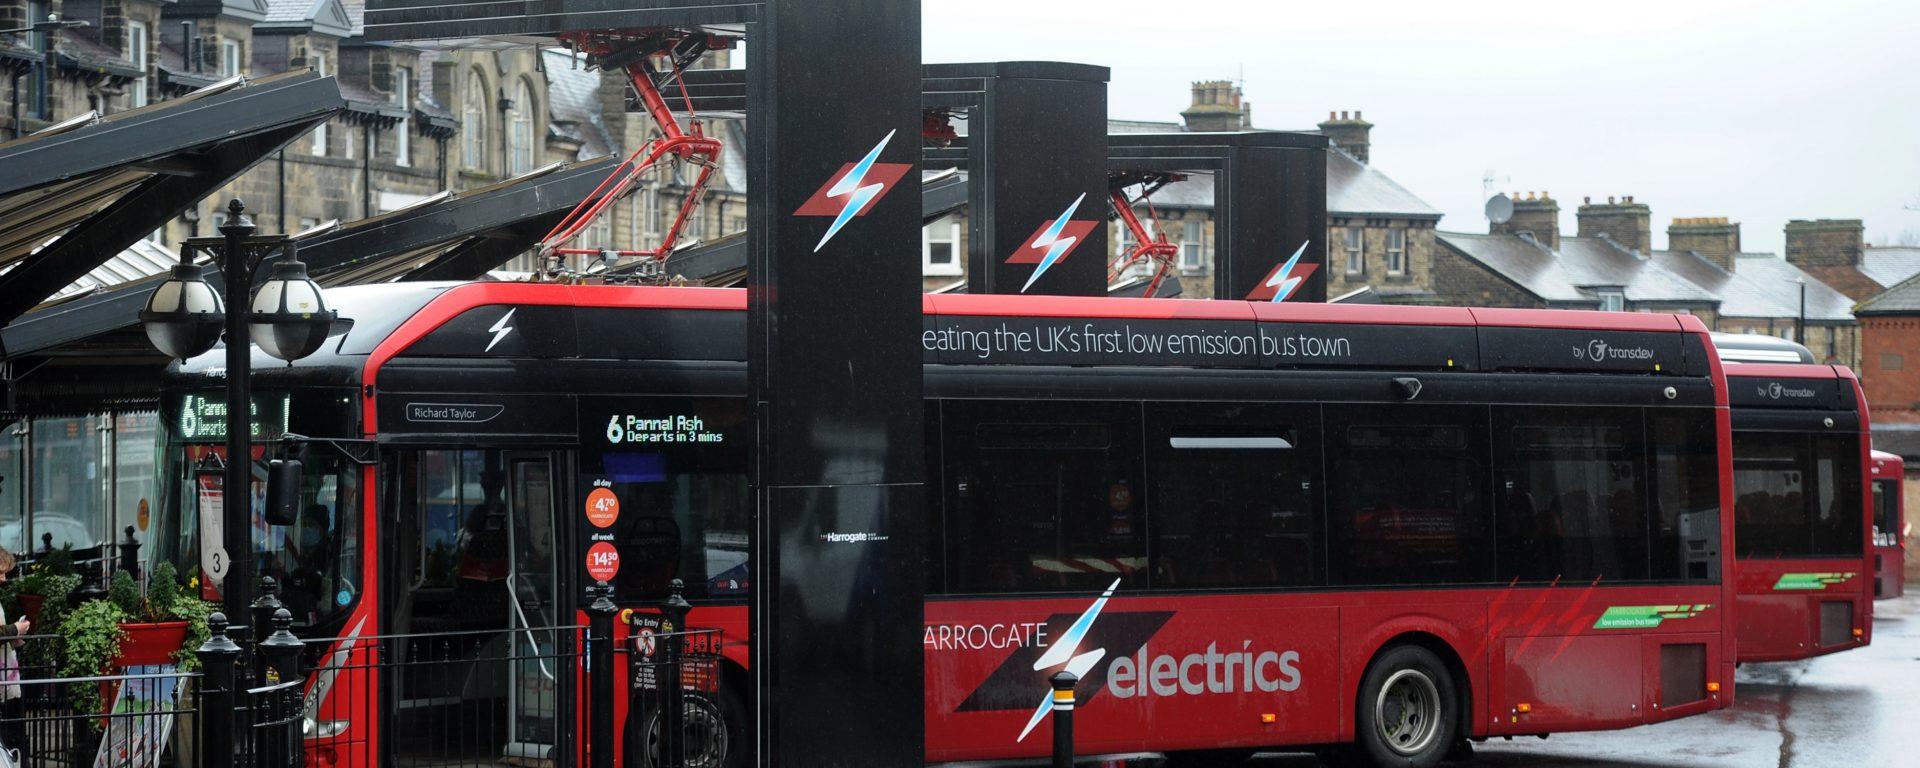 pic-1-harrogate-electrics-at-harrogate-bus-station